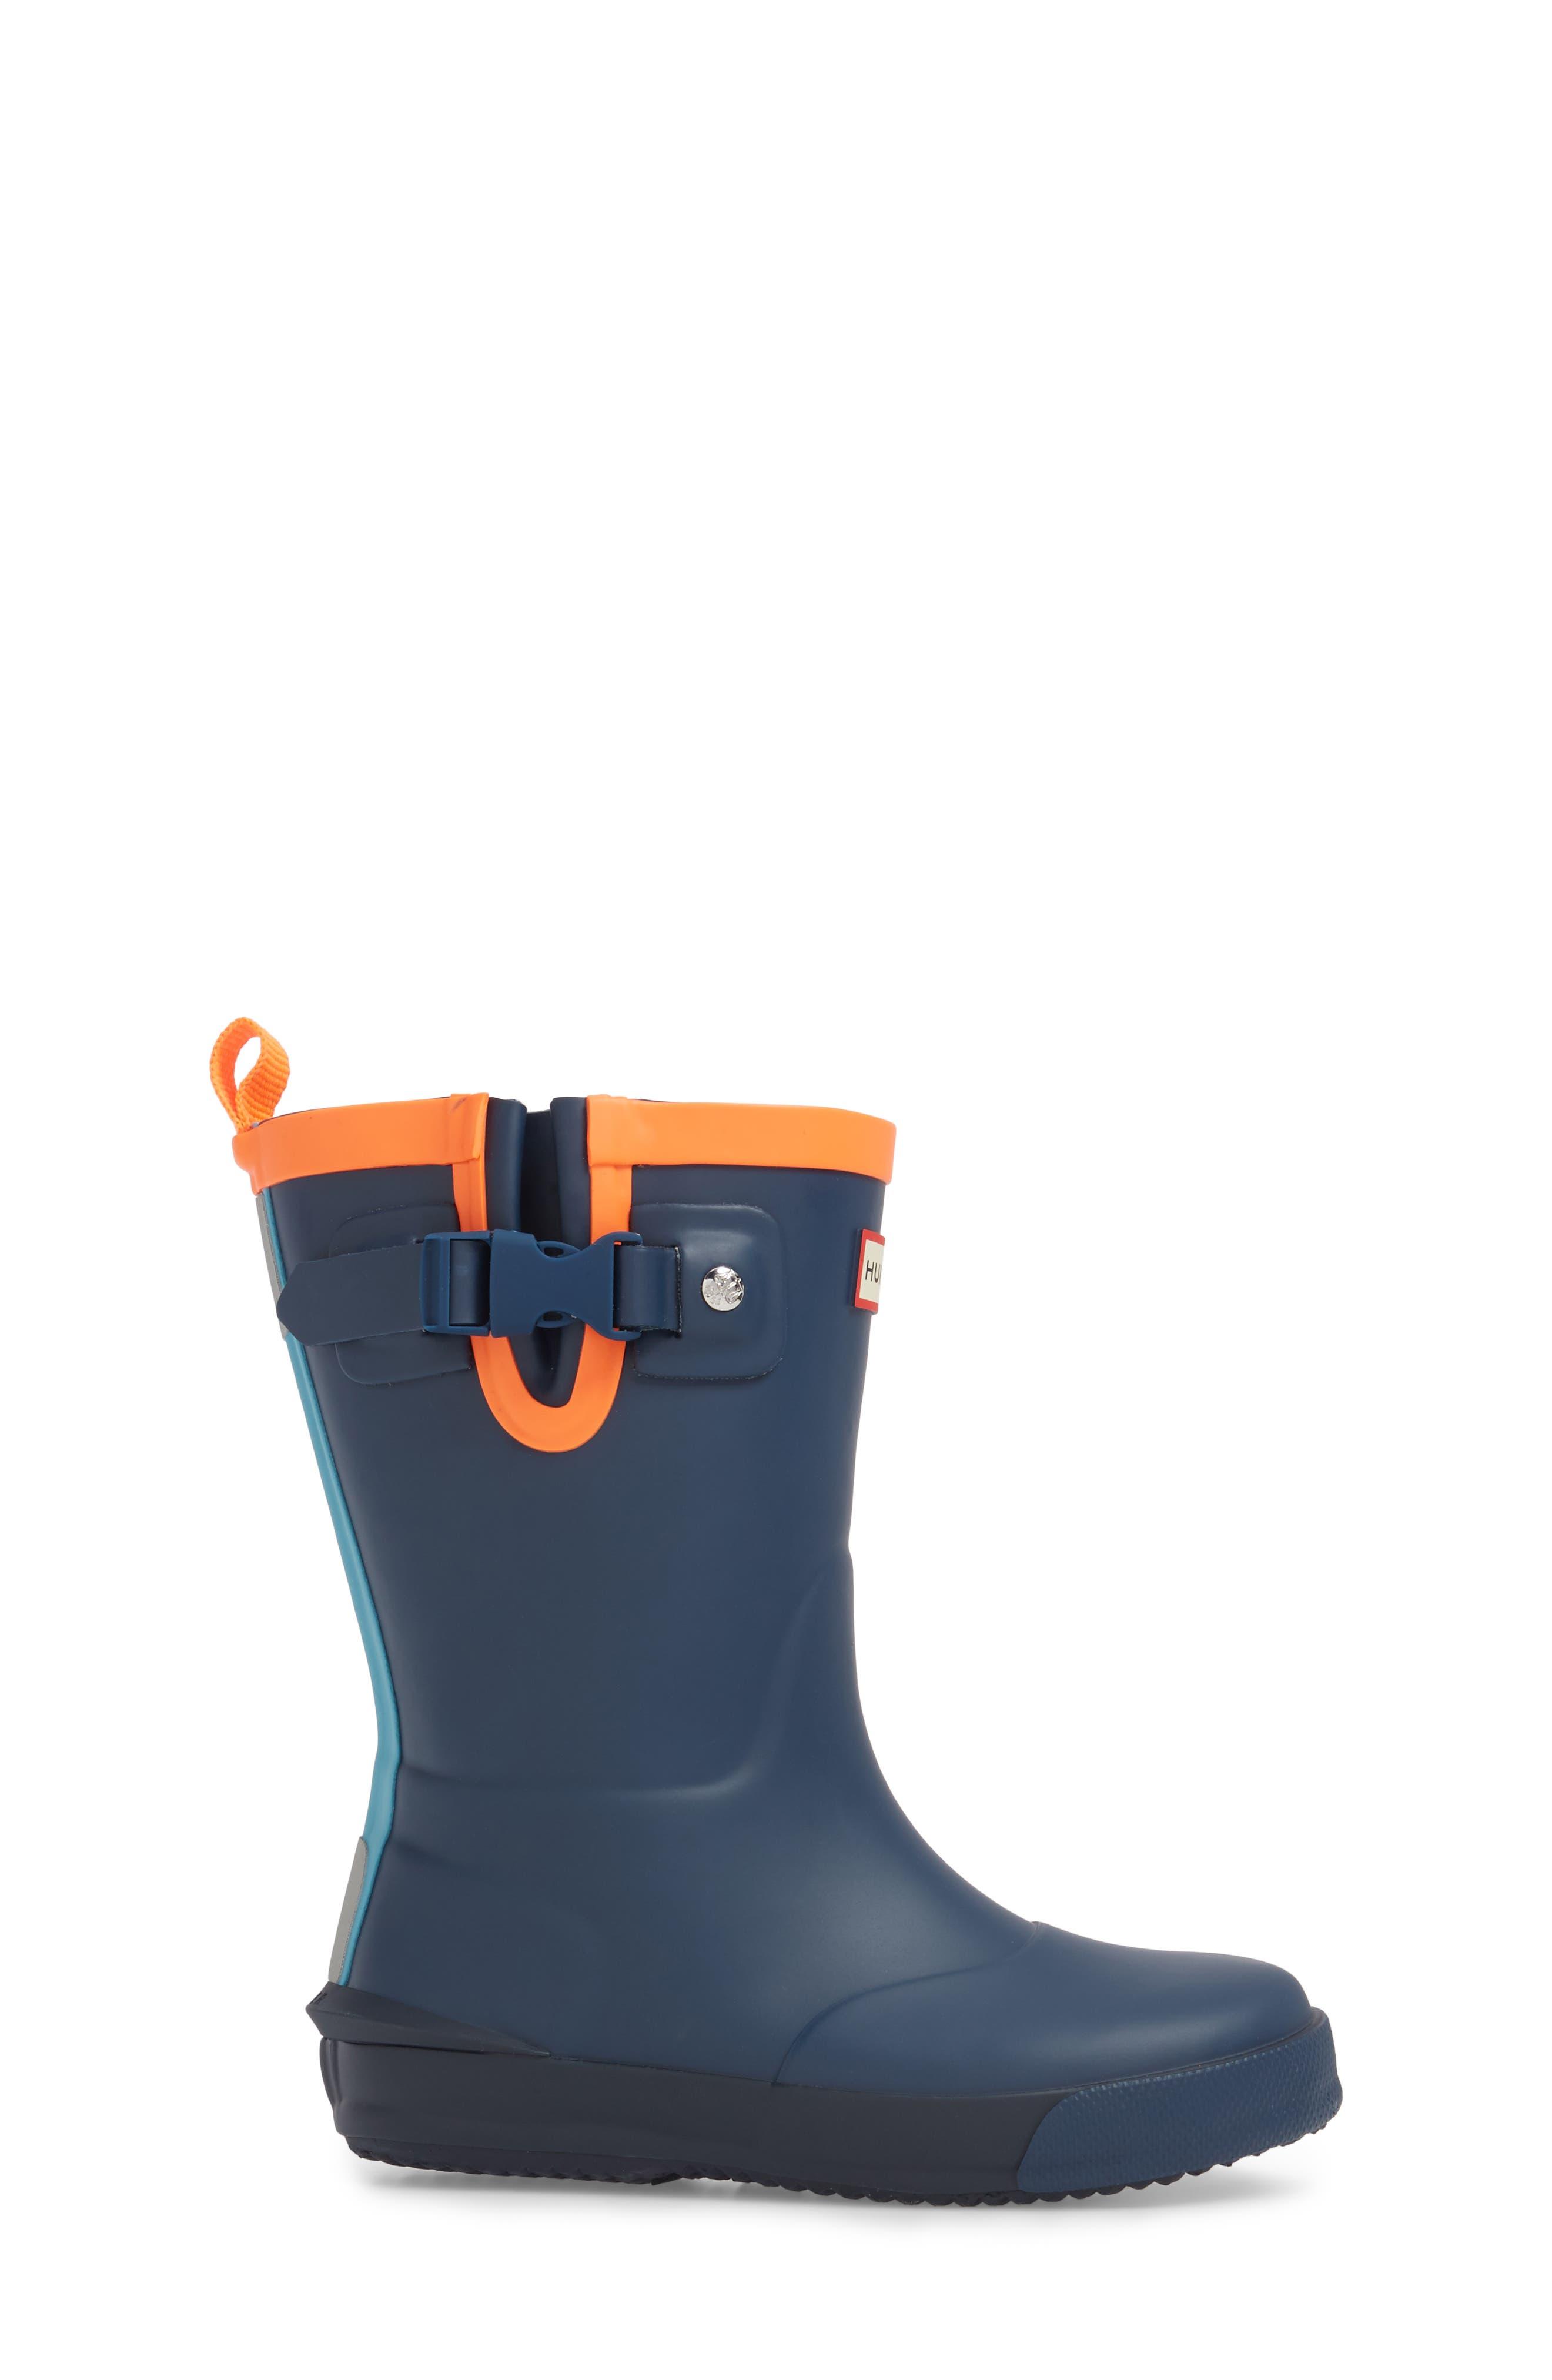 'Davison' Rain Boot,                             Alternate thumbnail 3, color,                             Dark Lake Blue/ Navy/ Hazard